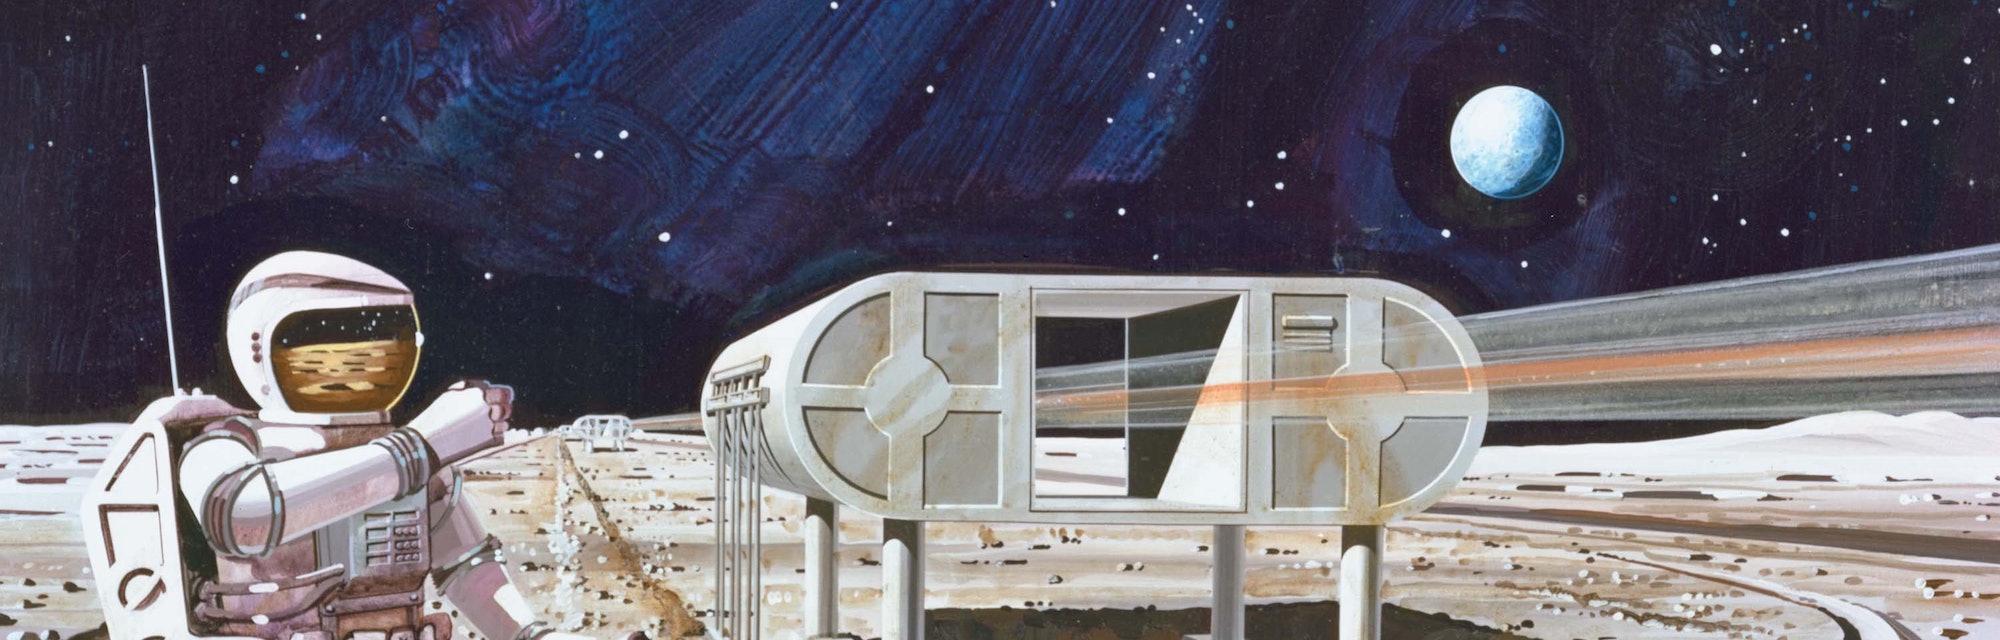 Artist's render of lunar habitat